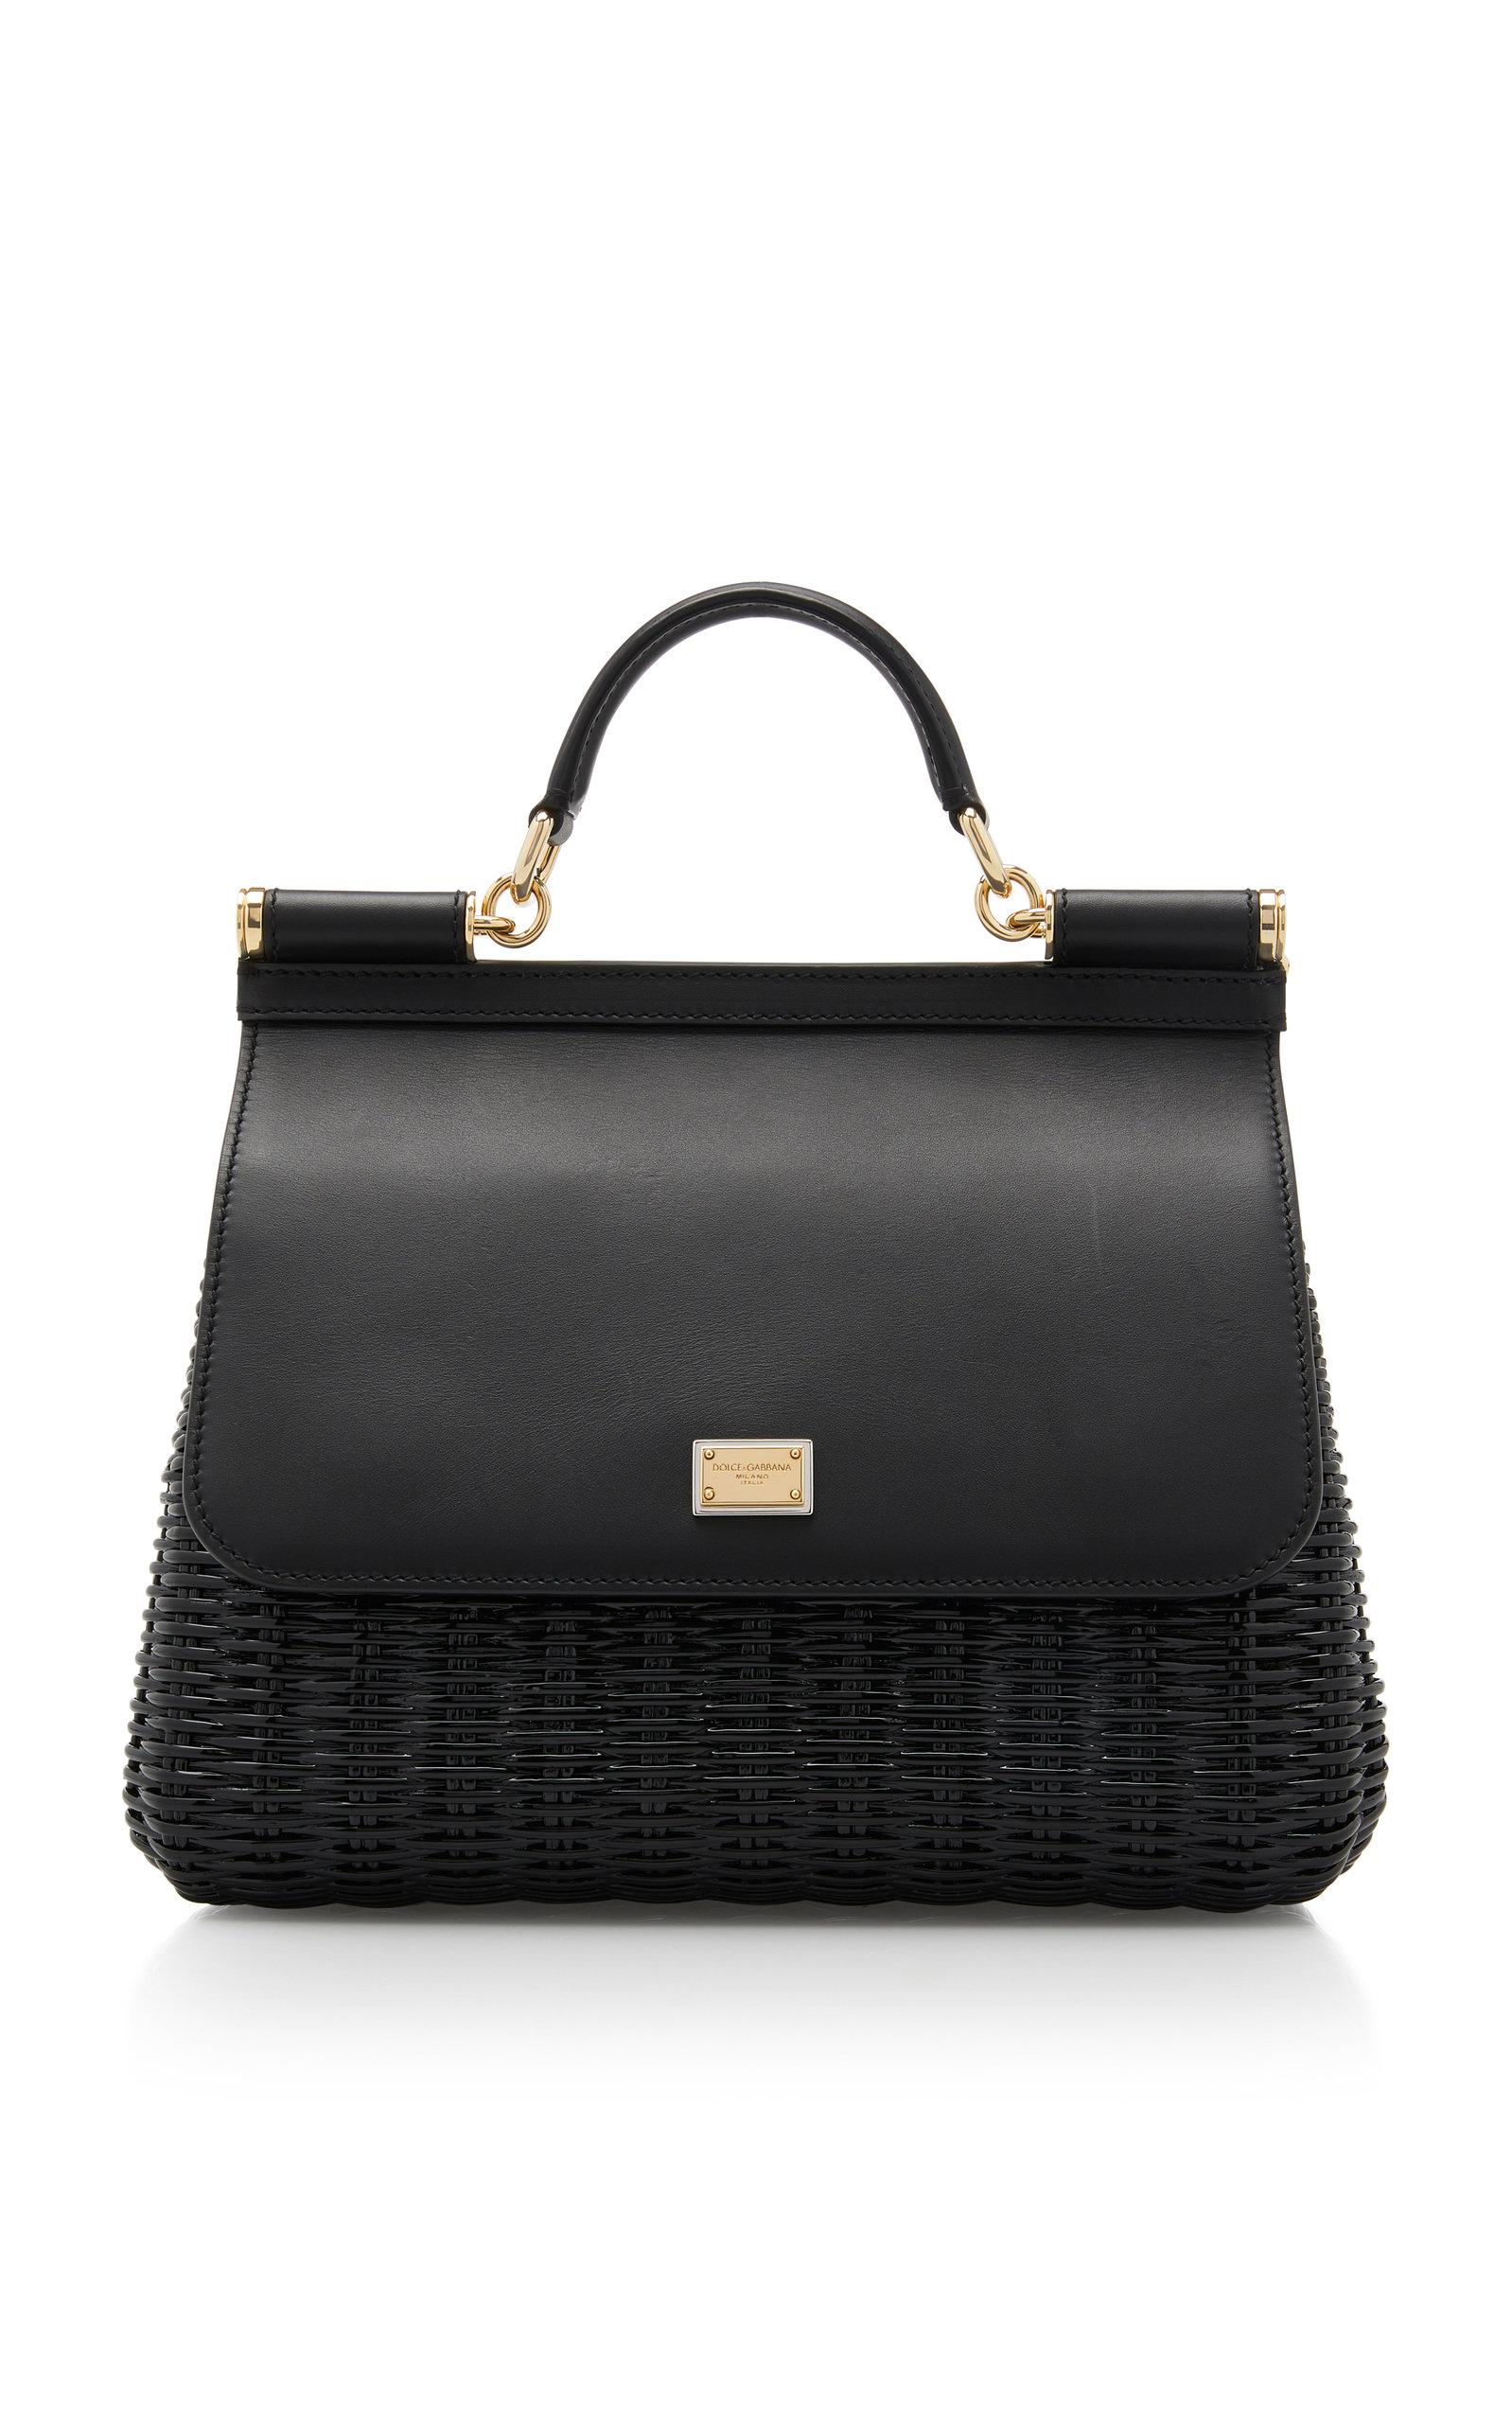 2a0e71af59 Leather Sicily Bag by Dolce   Gabbana